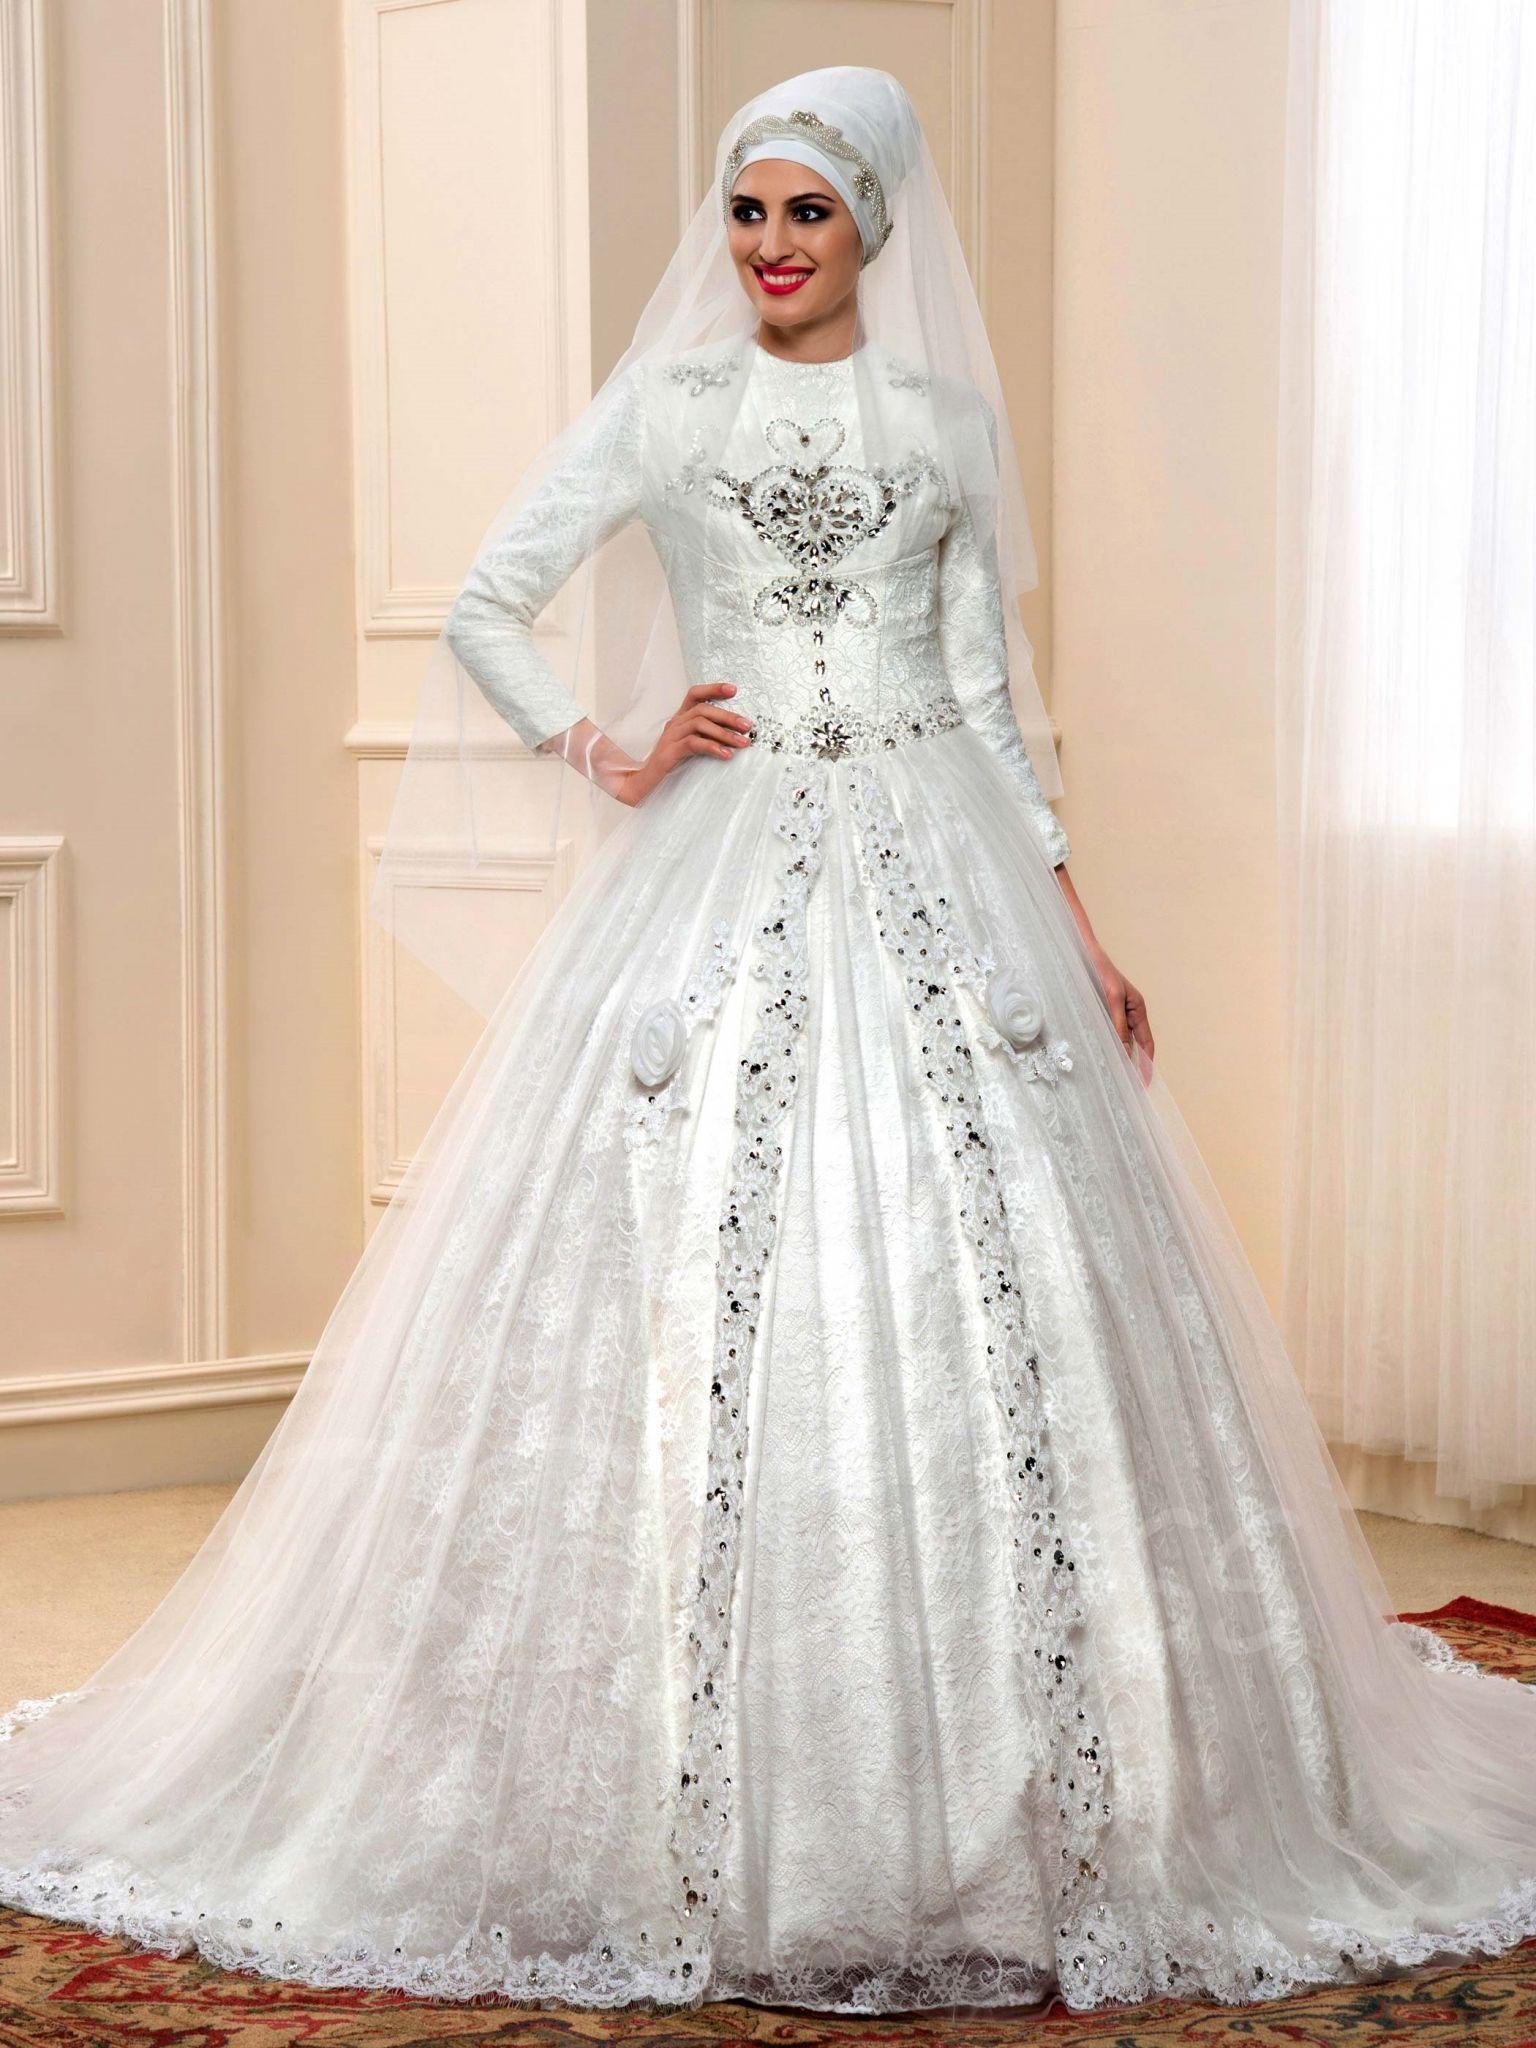 Muslim wedding bridesmaid dresses cute dresses for a wedding muslim wedding bridesmaid dresses cute dresses for a wedding check more at http ombrellifo Gallery